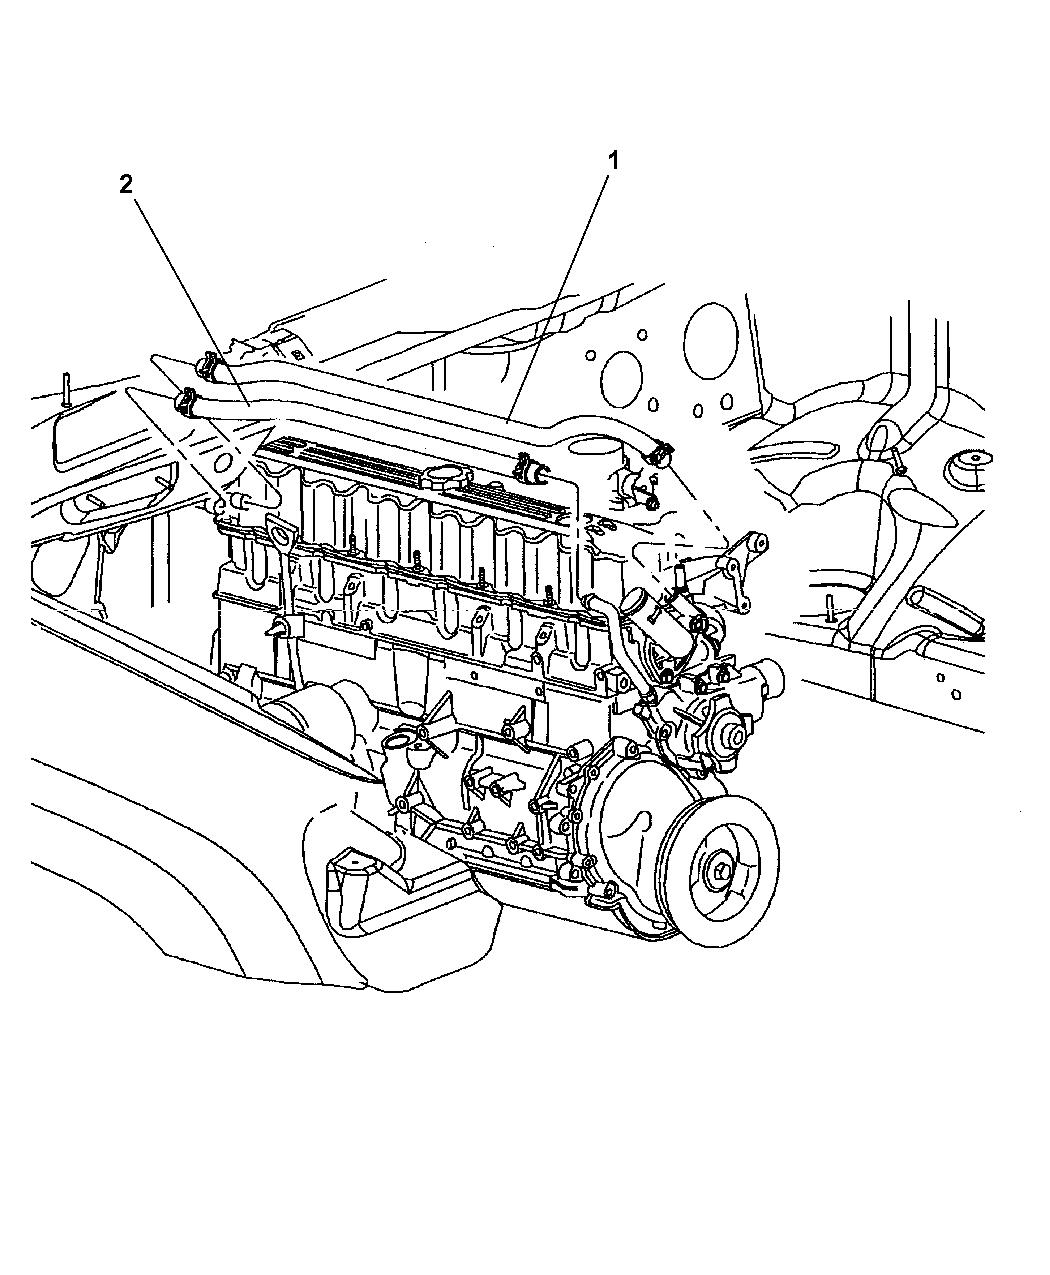 2000 jeep grand cherokee heater hoses mopar parts giant rh moparpartsgiant com jeep yj heater hose diagram 96 jeep cherokee heater hose diagram